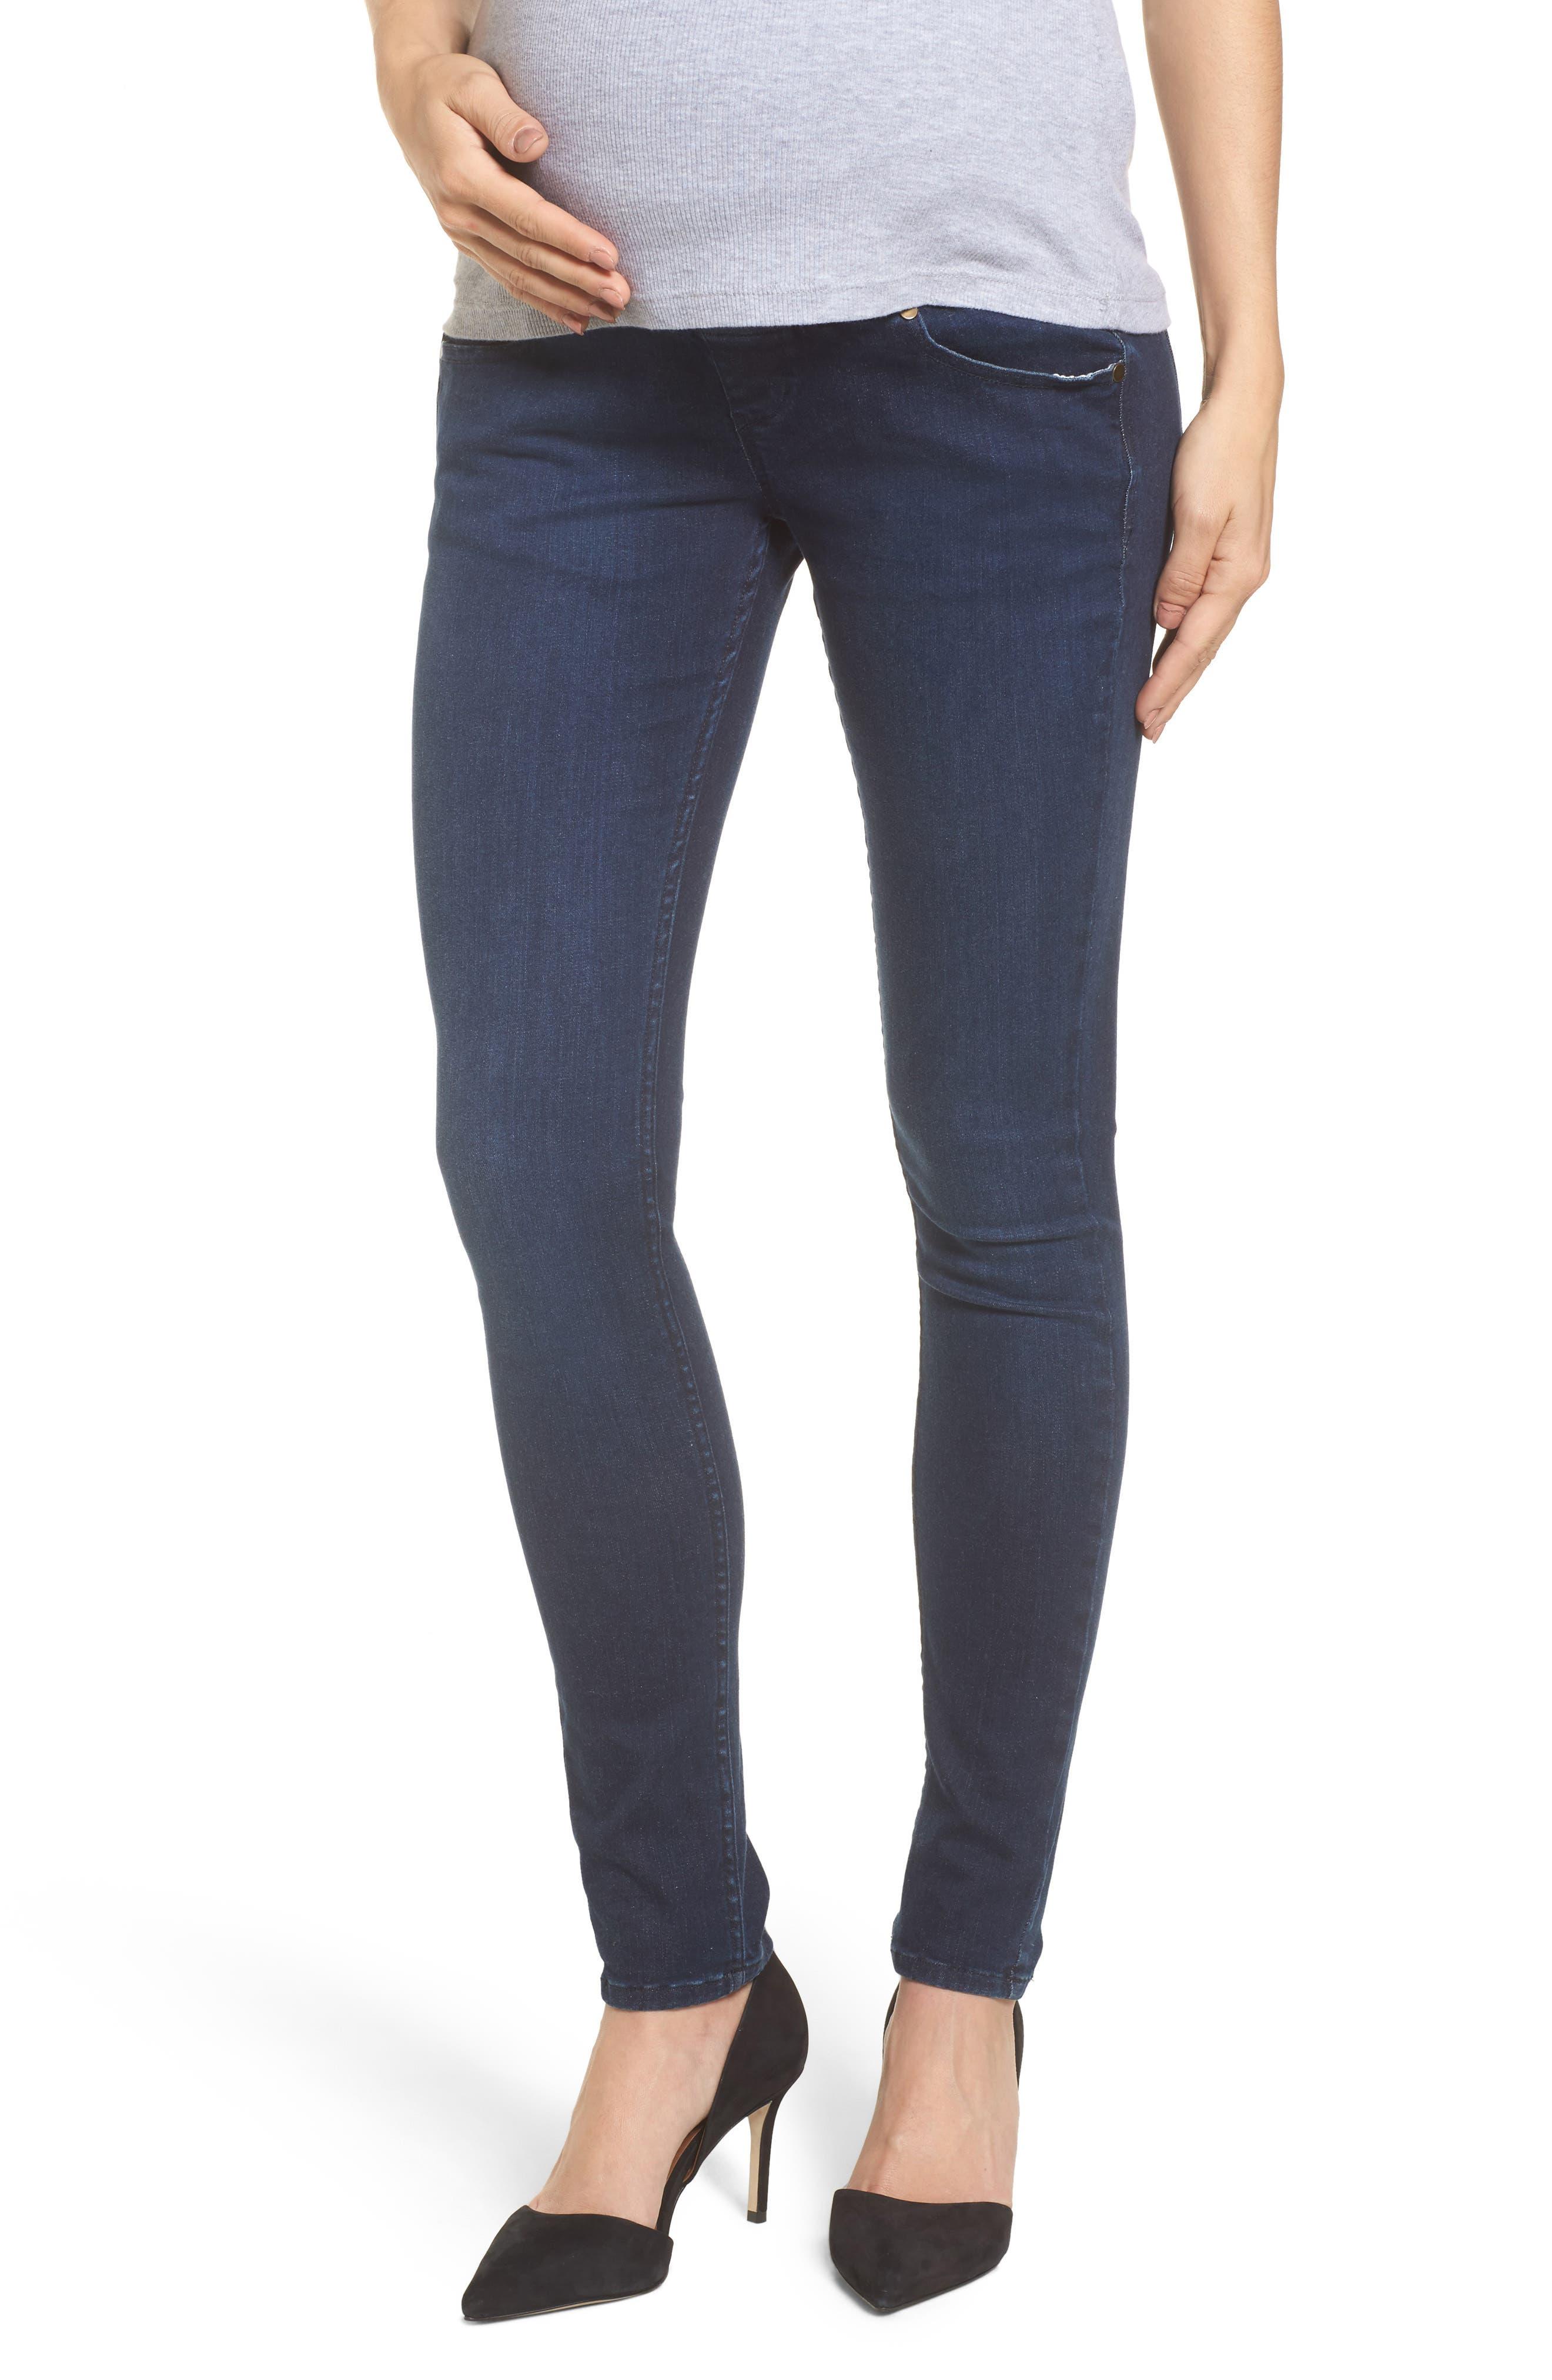 Super Stretch Maternity Skinny Jeans